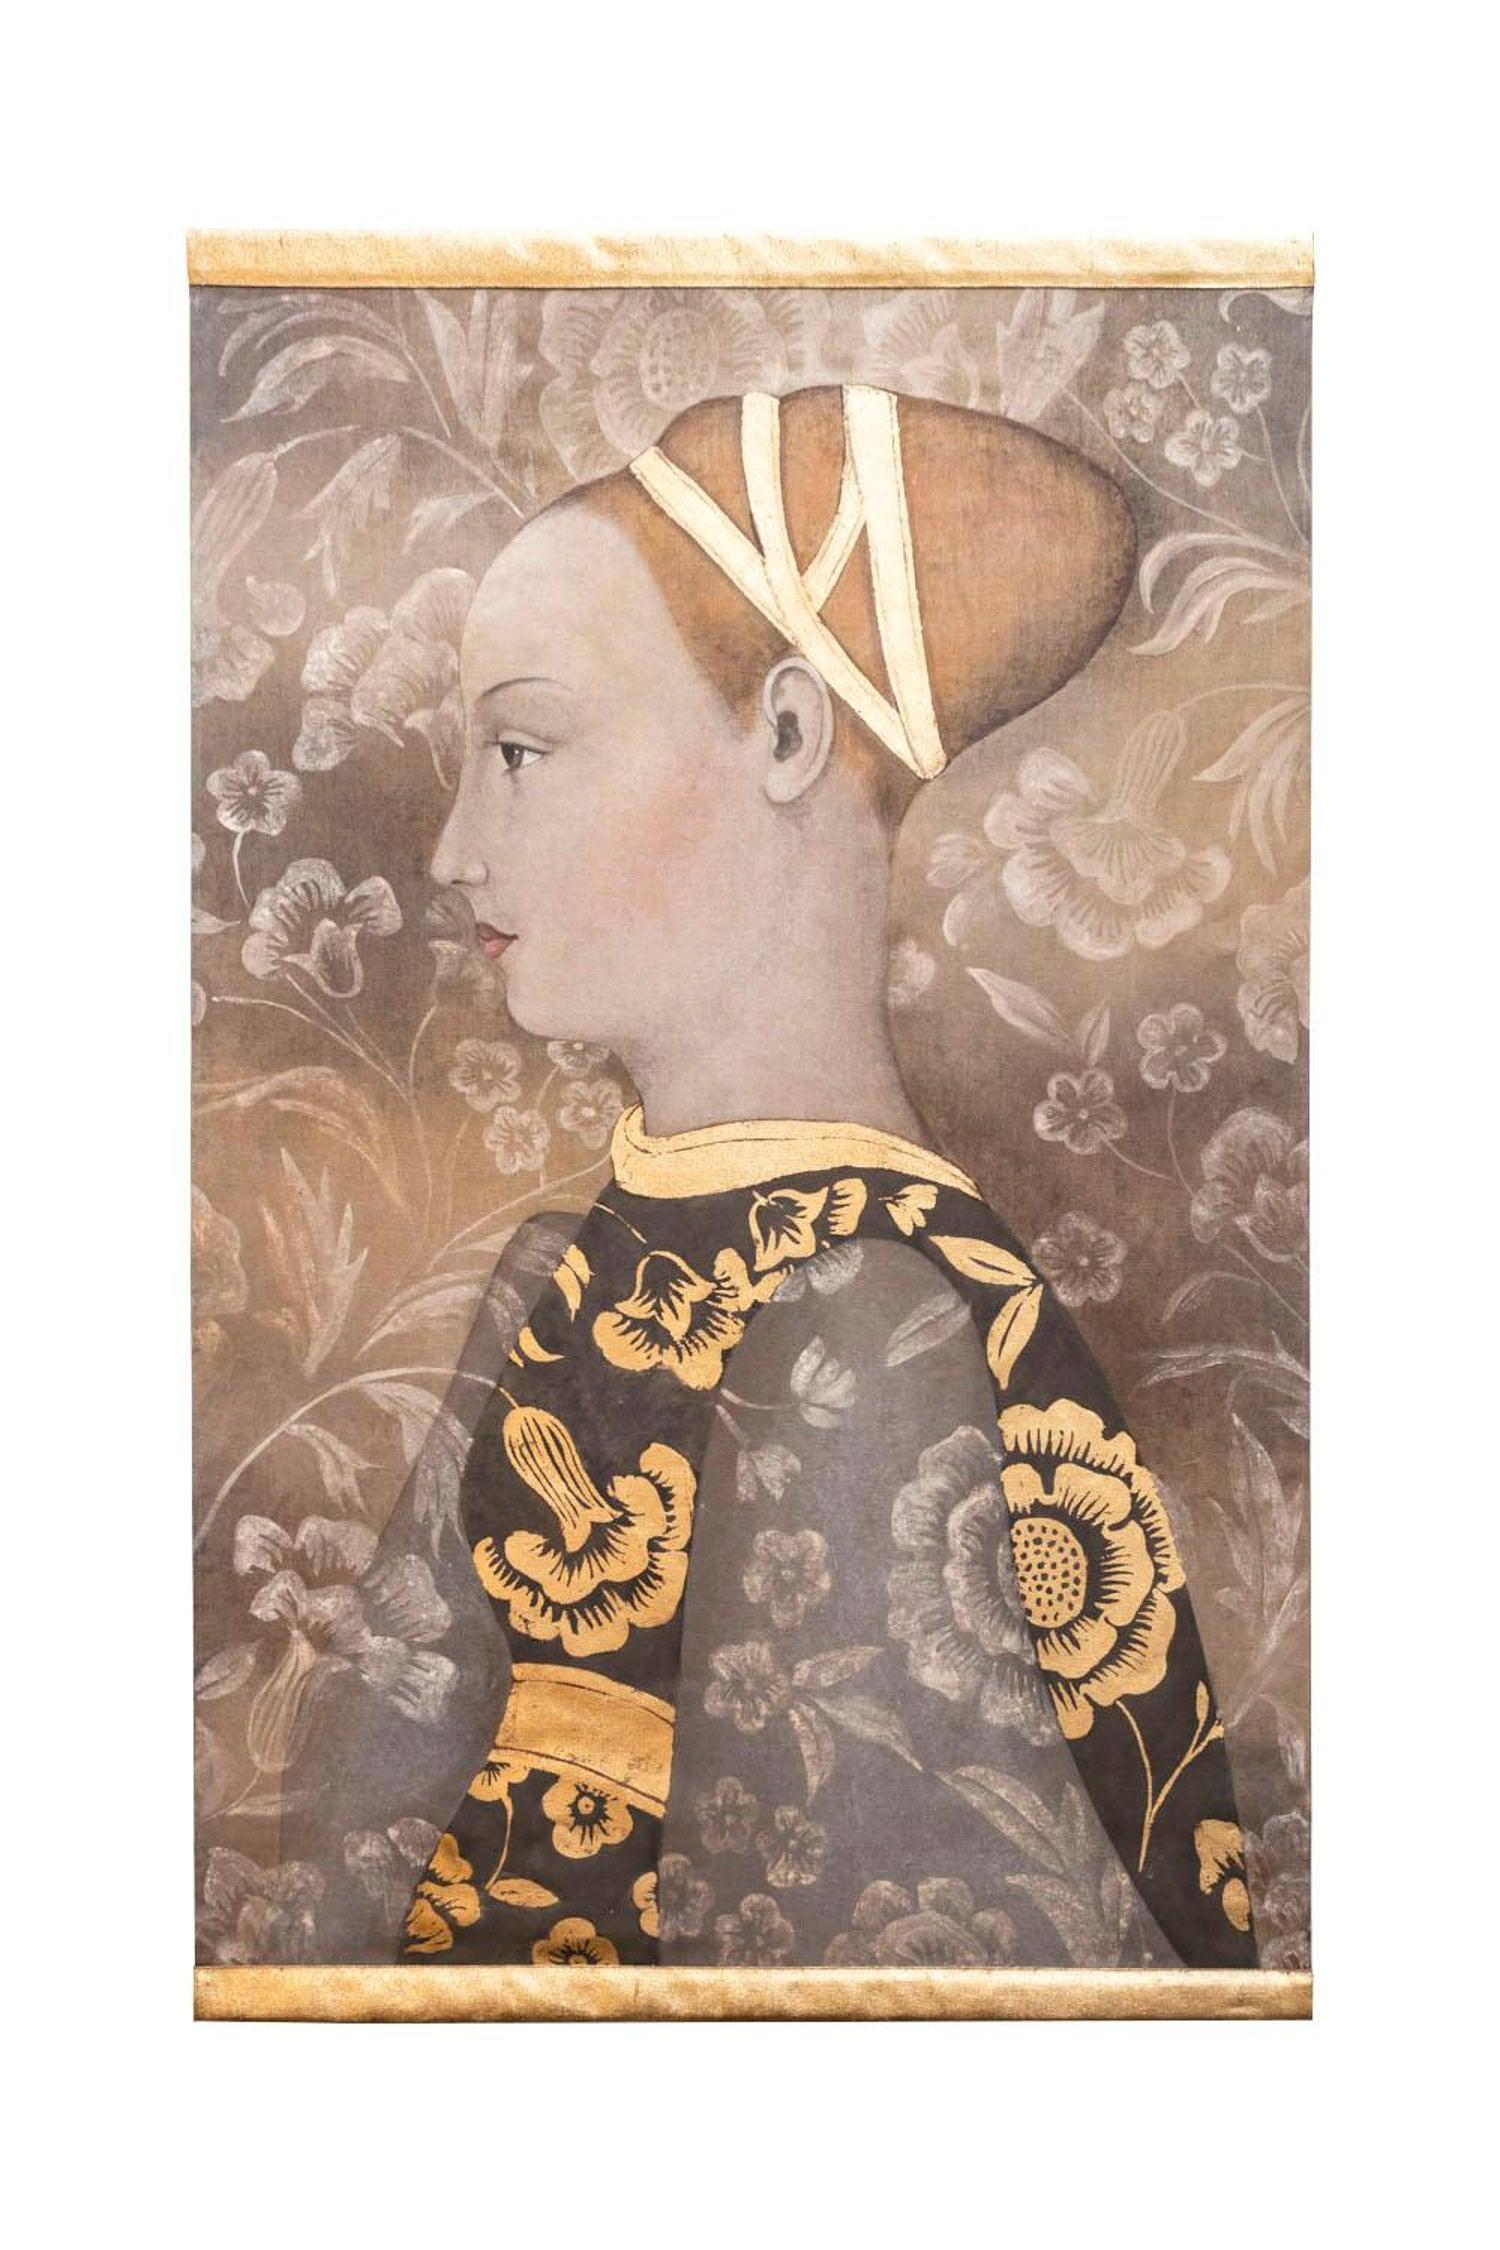 Painted Canvas Of A Renaissance Style Woman Portrait Contemporary Work